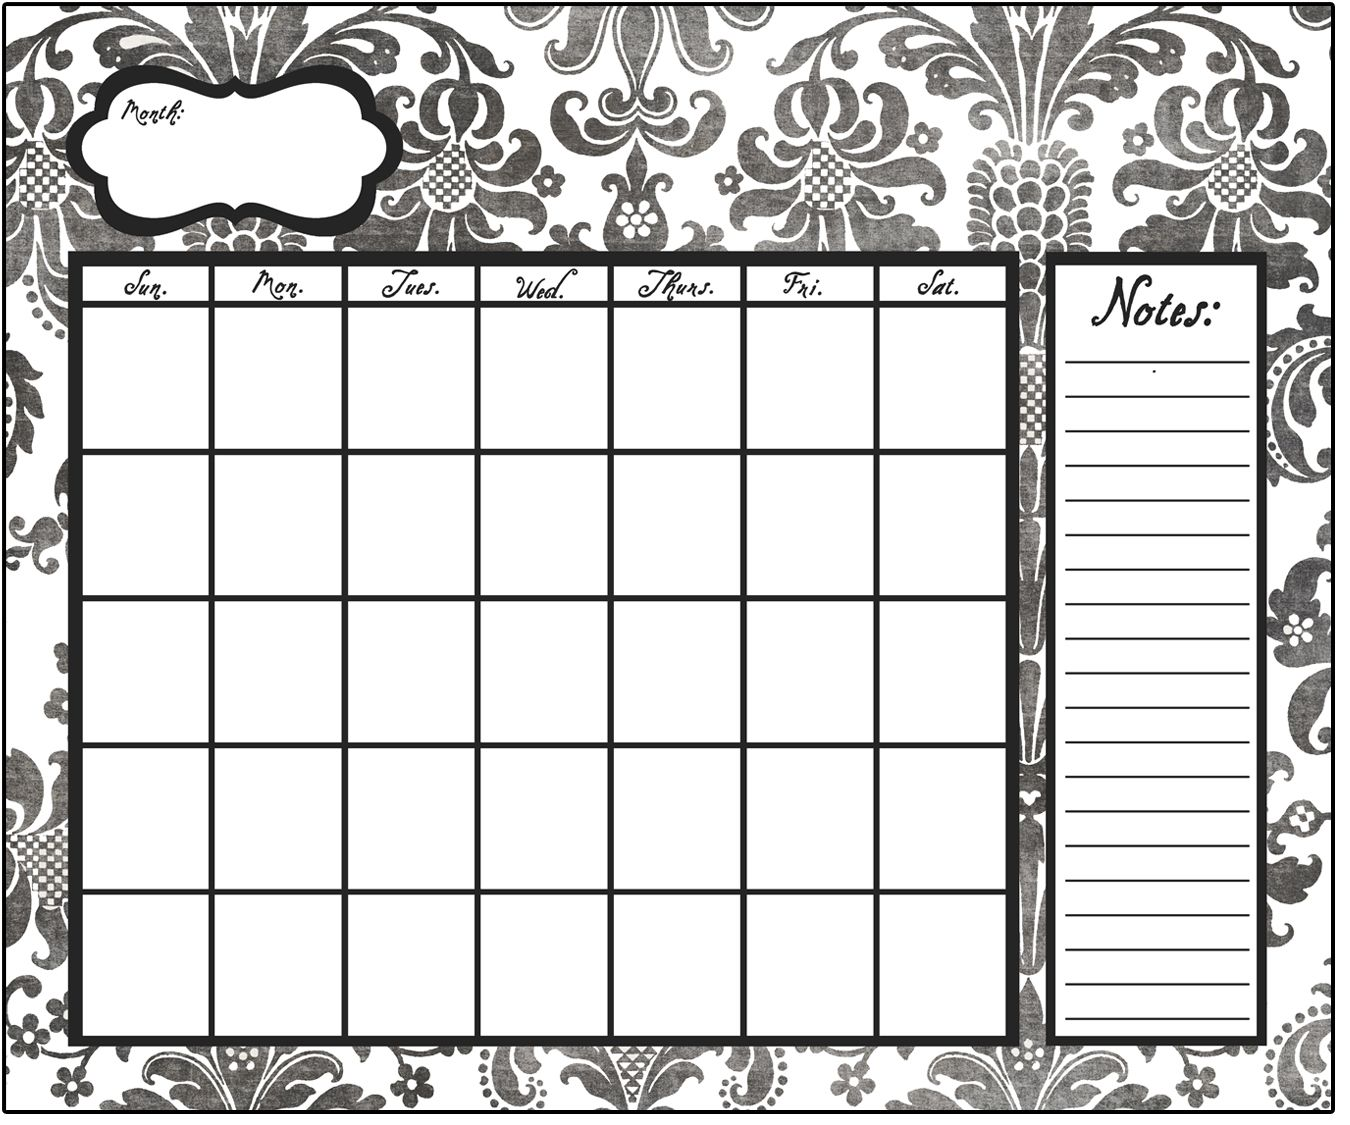 Black Damask Dry Erase Calendar By Poppy Seed Projects.com